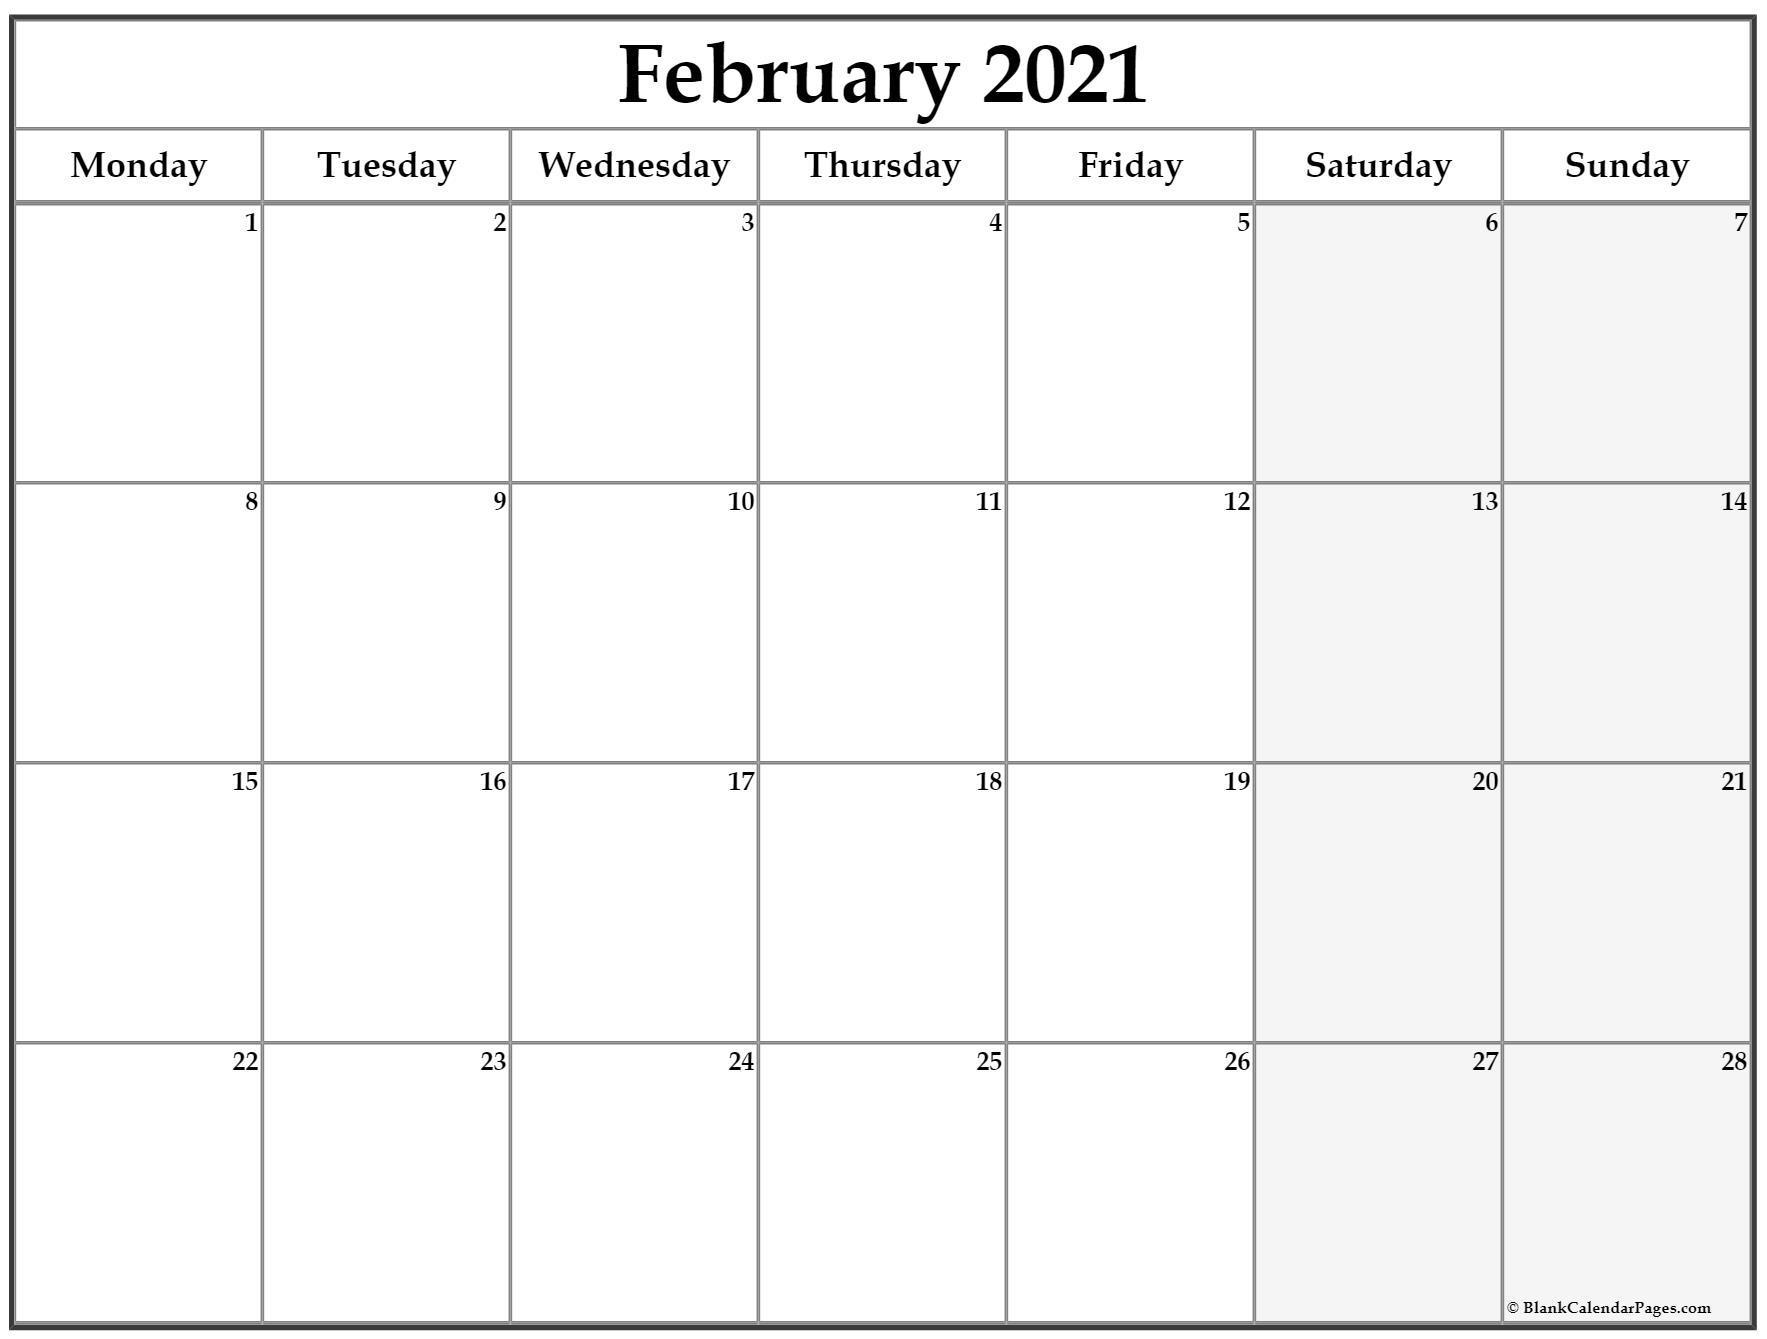 2021 Monthly Calendar Excel | Printablecalendarsfor2021 regarding 2021 Calendar Excel Start Monday